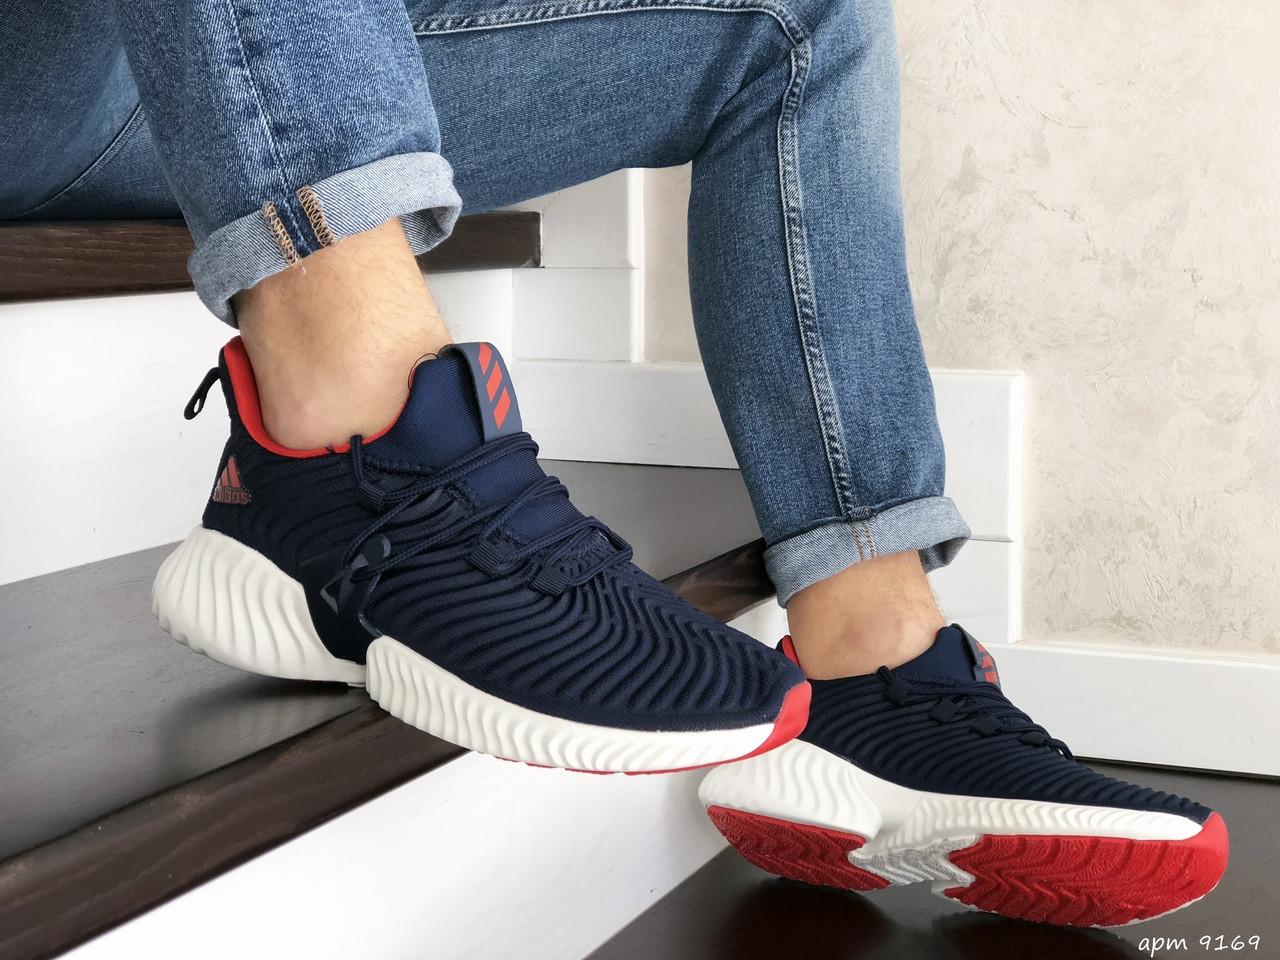 Мужские кроссовки (в стиле) Adidas,текстиль,темно синие